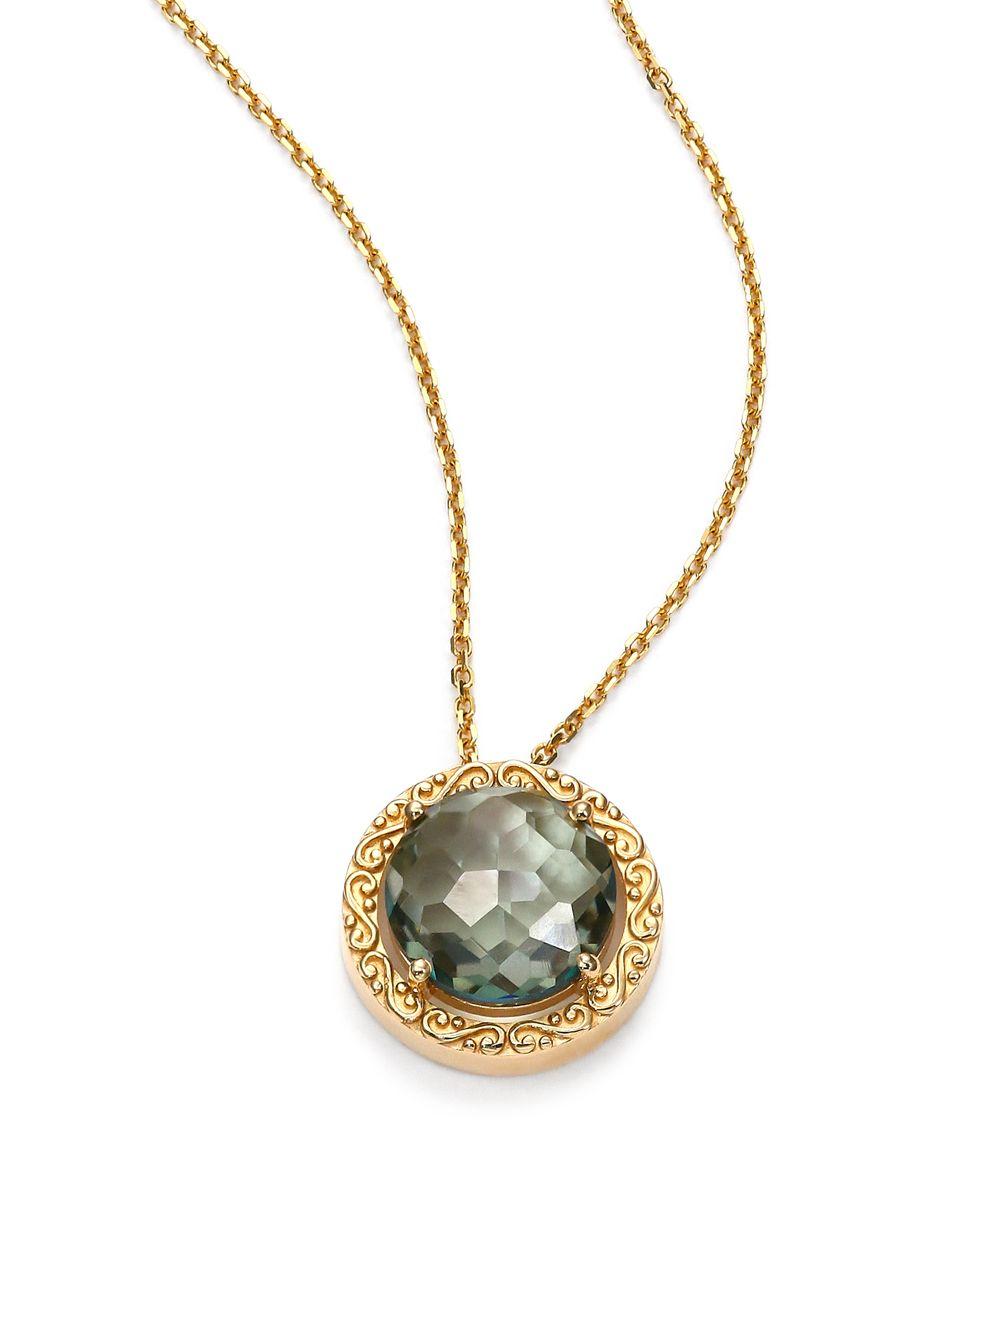 Suzanne Kalan 14k Green Amethyst Pendant Necklace qXe3OzCQ8A